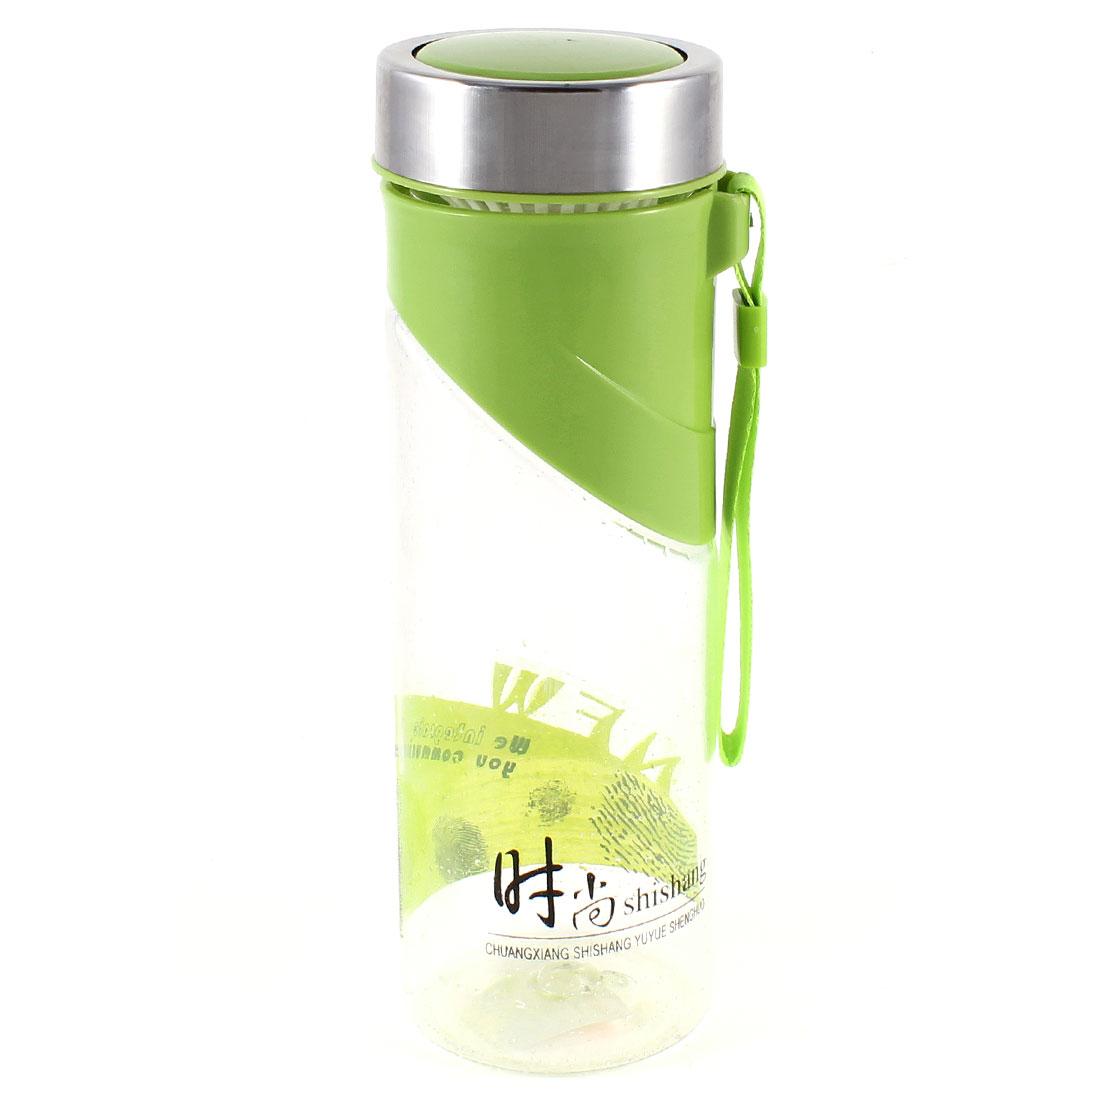 Portable Hiking 500ml Green Clear Plastic Water Bottle Holder w Tea Strainer